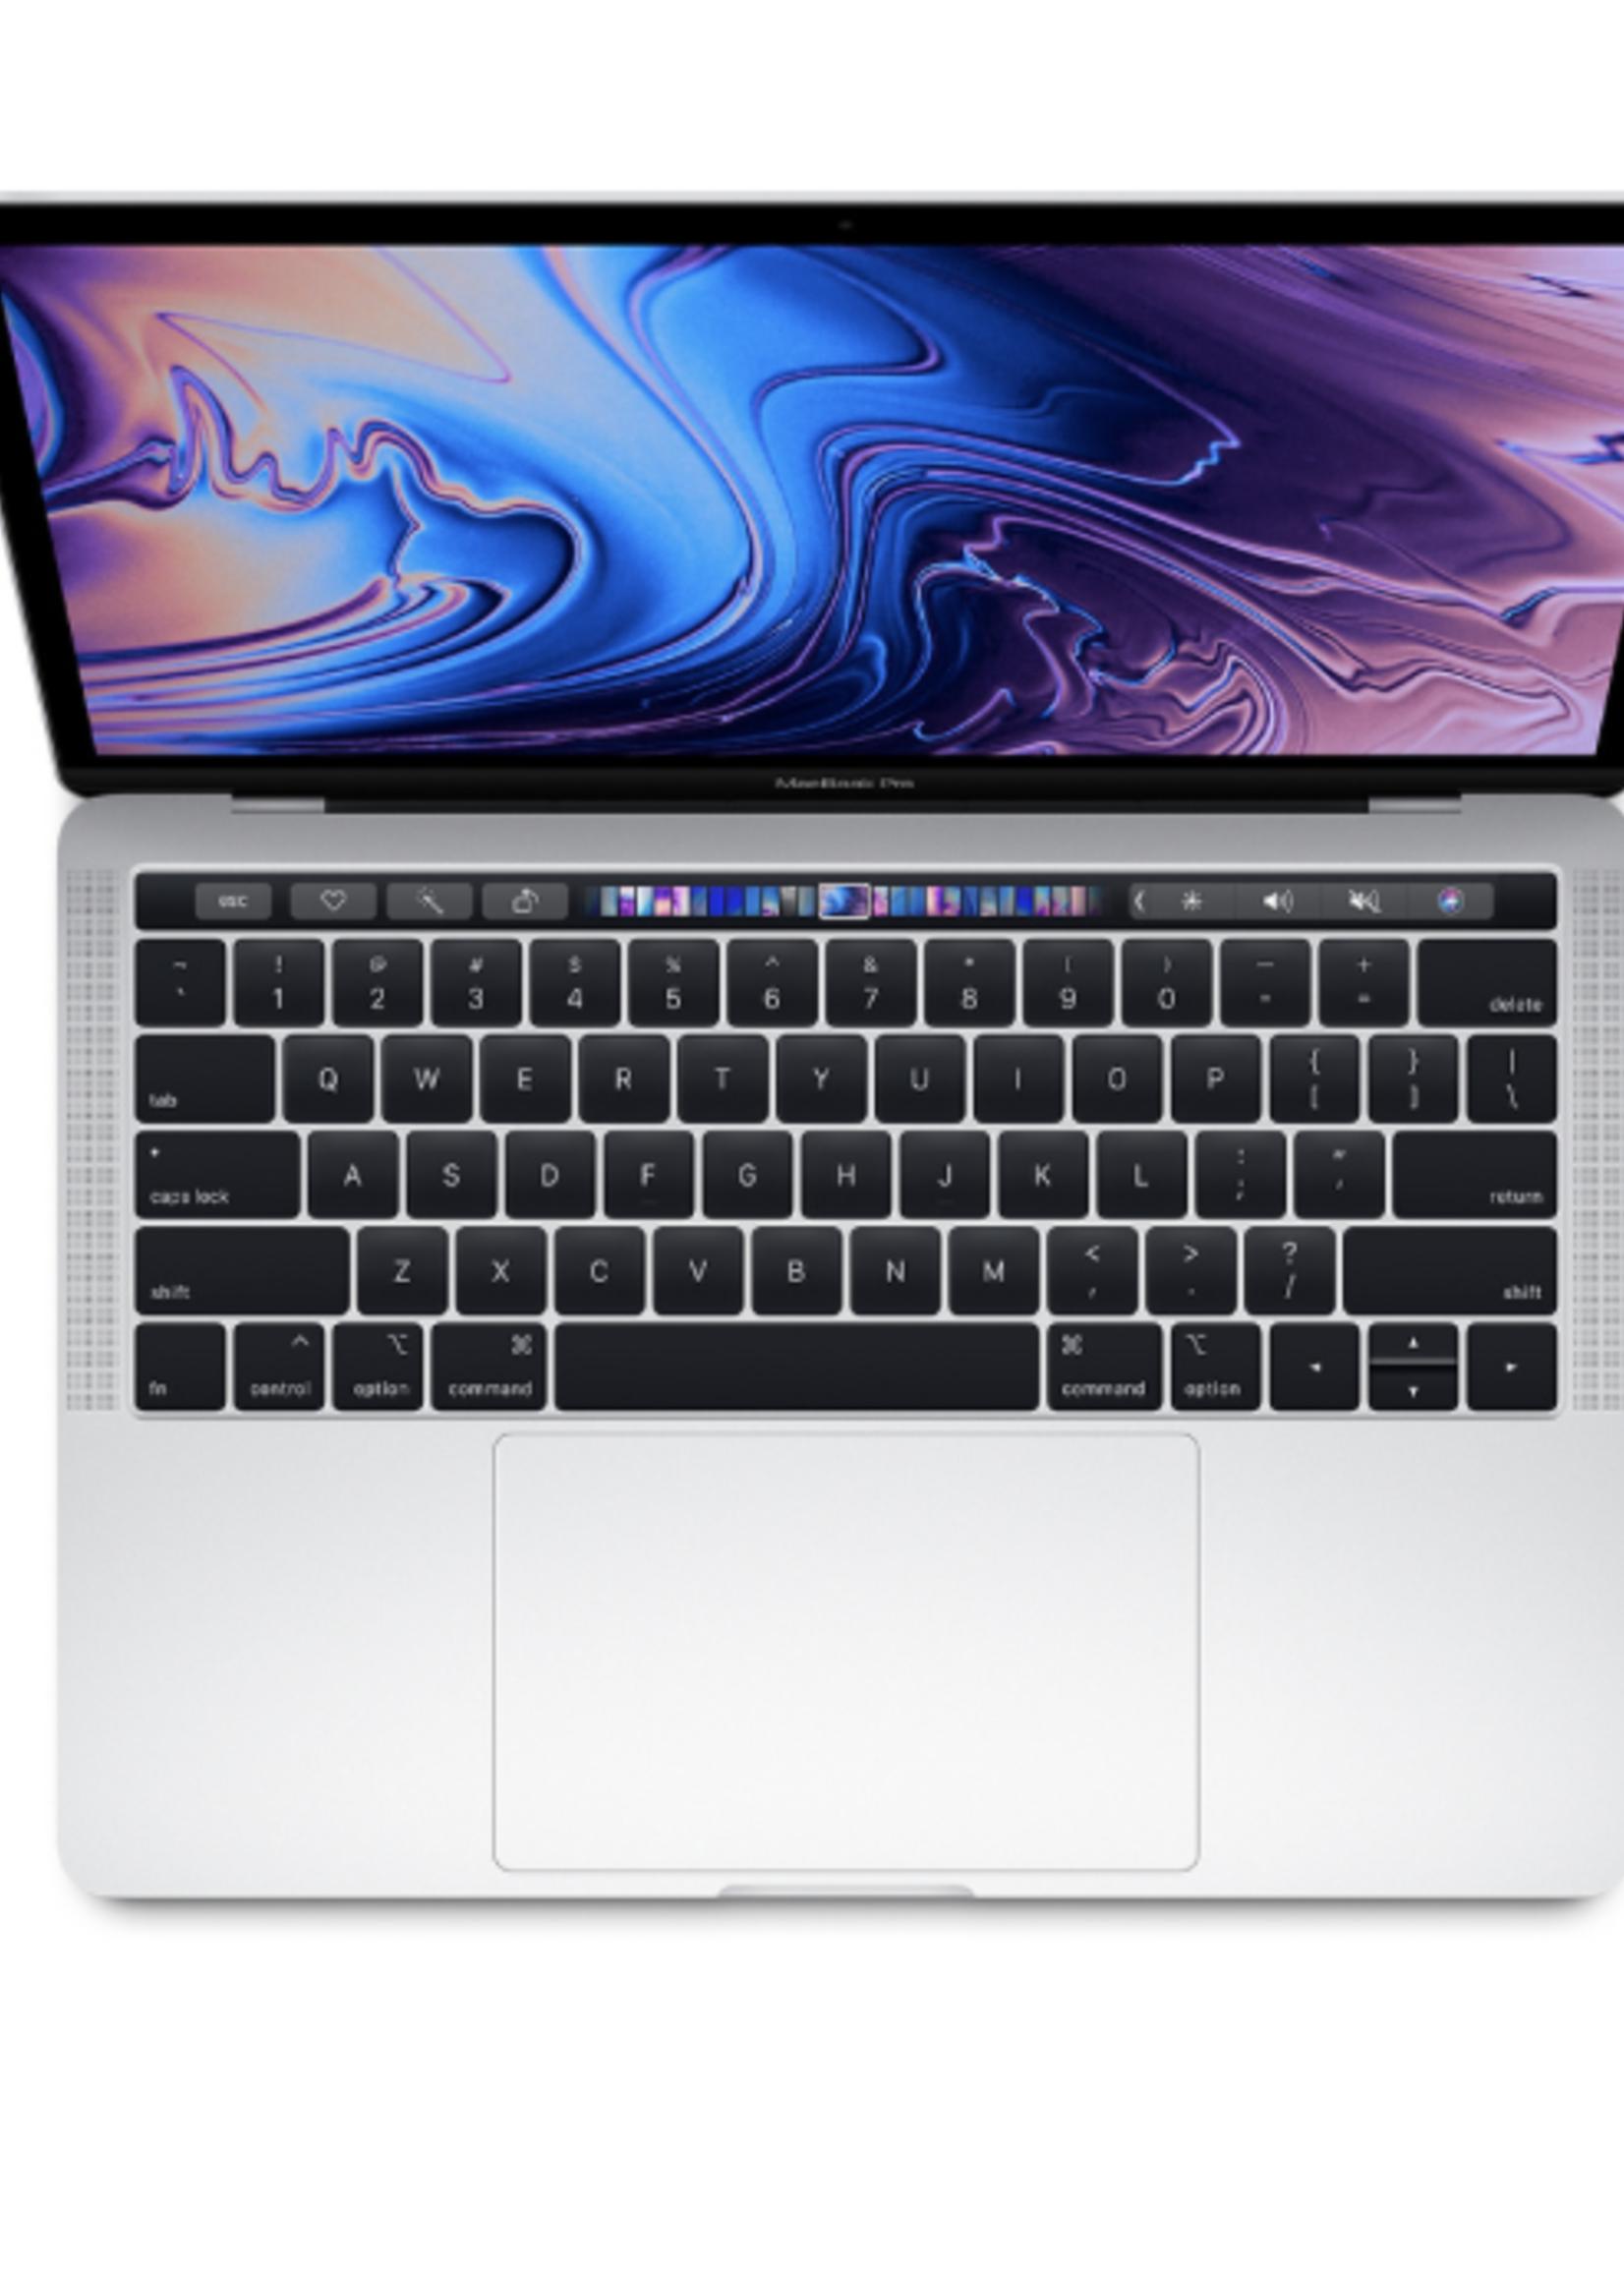 "13"" Macbook Pro w/ touch bar - 256GB - Silver"